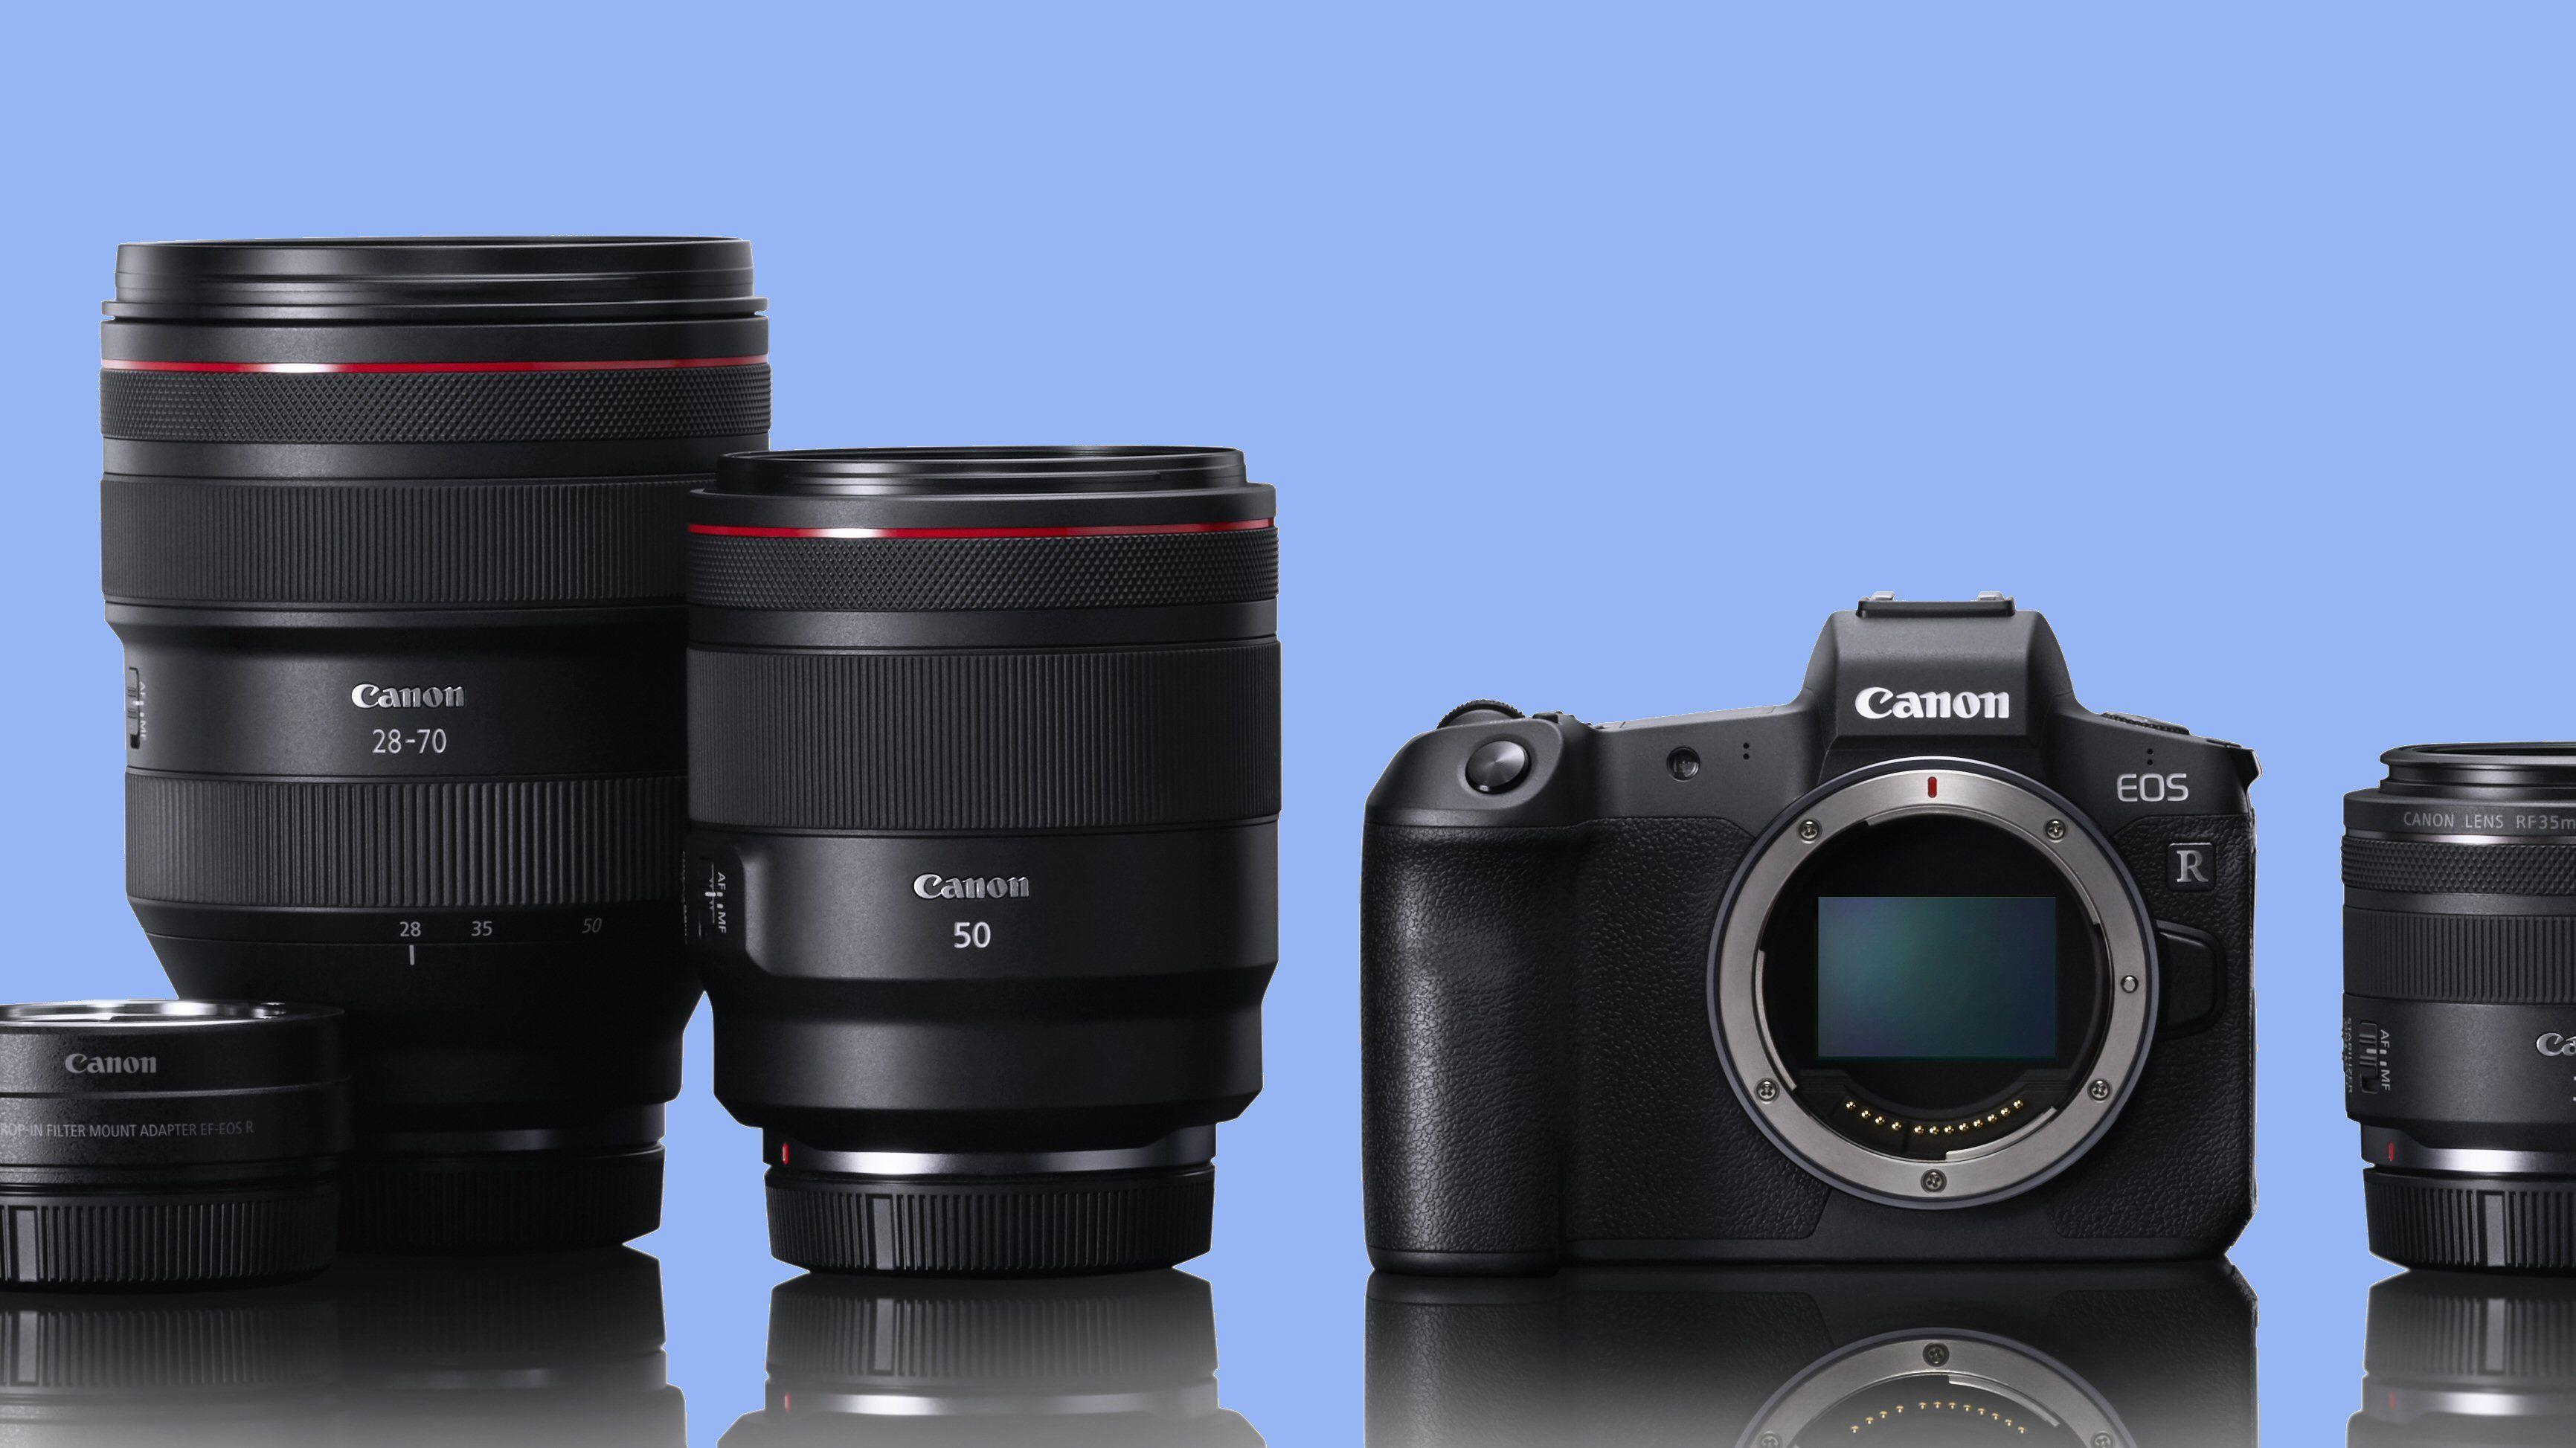 Slik er Canons nye kamerasystem